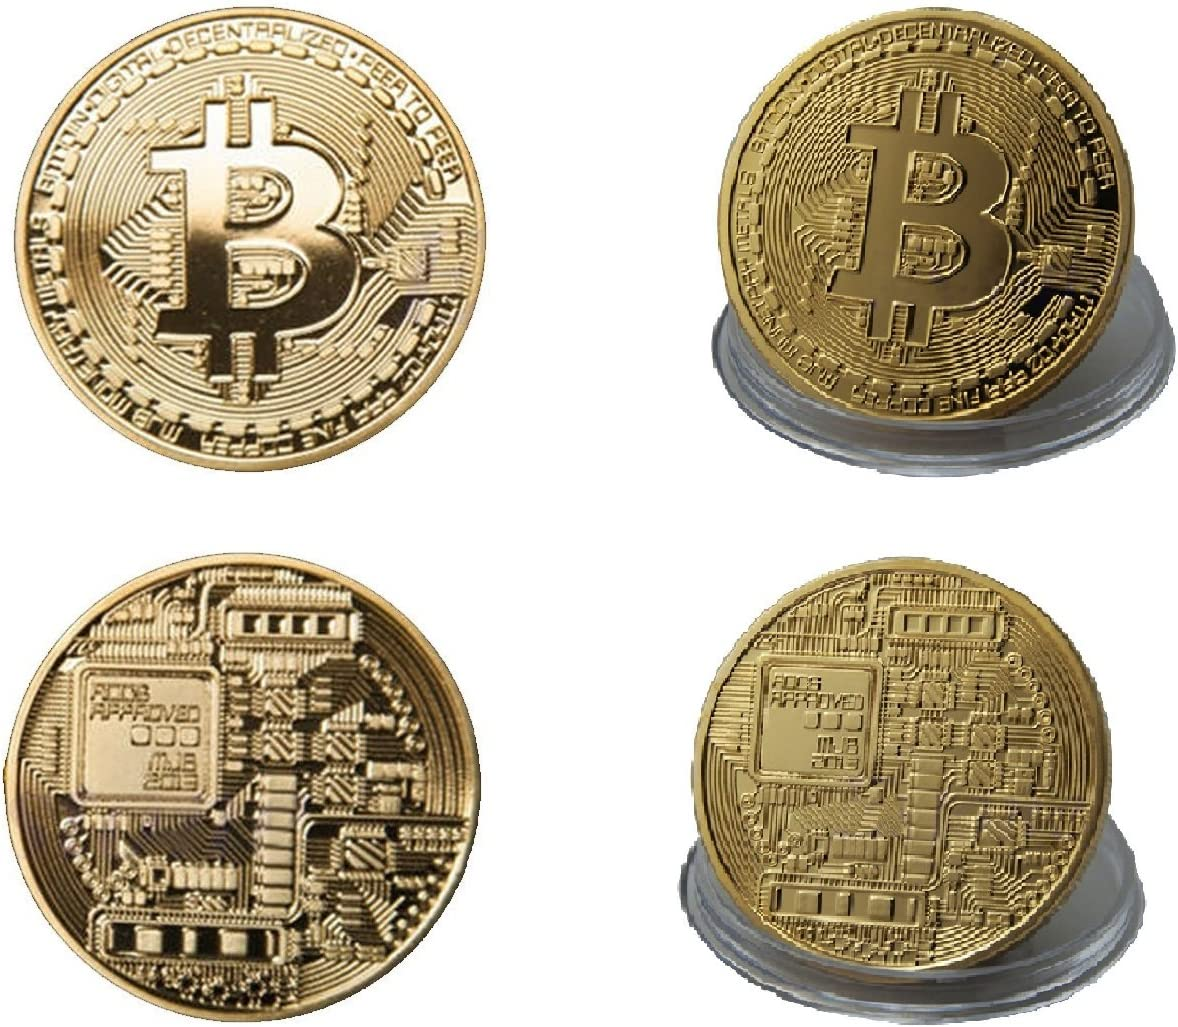 Pariuri cripto monede